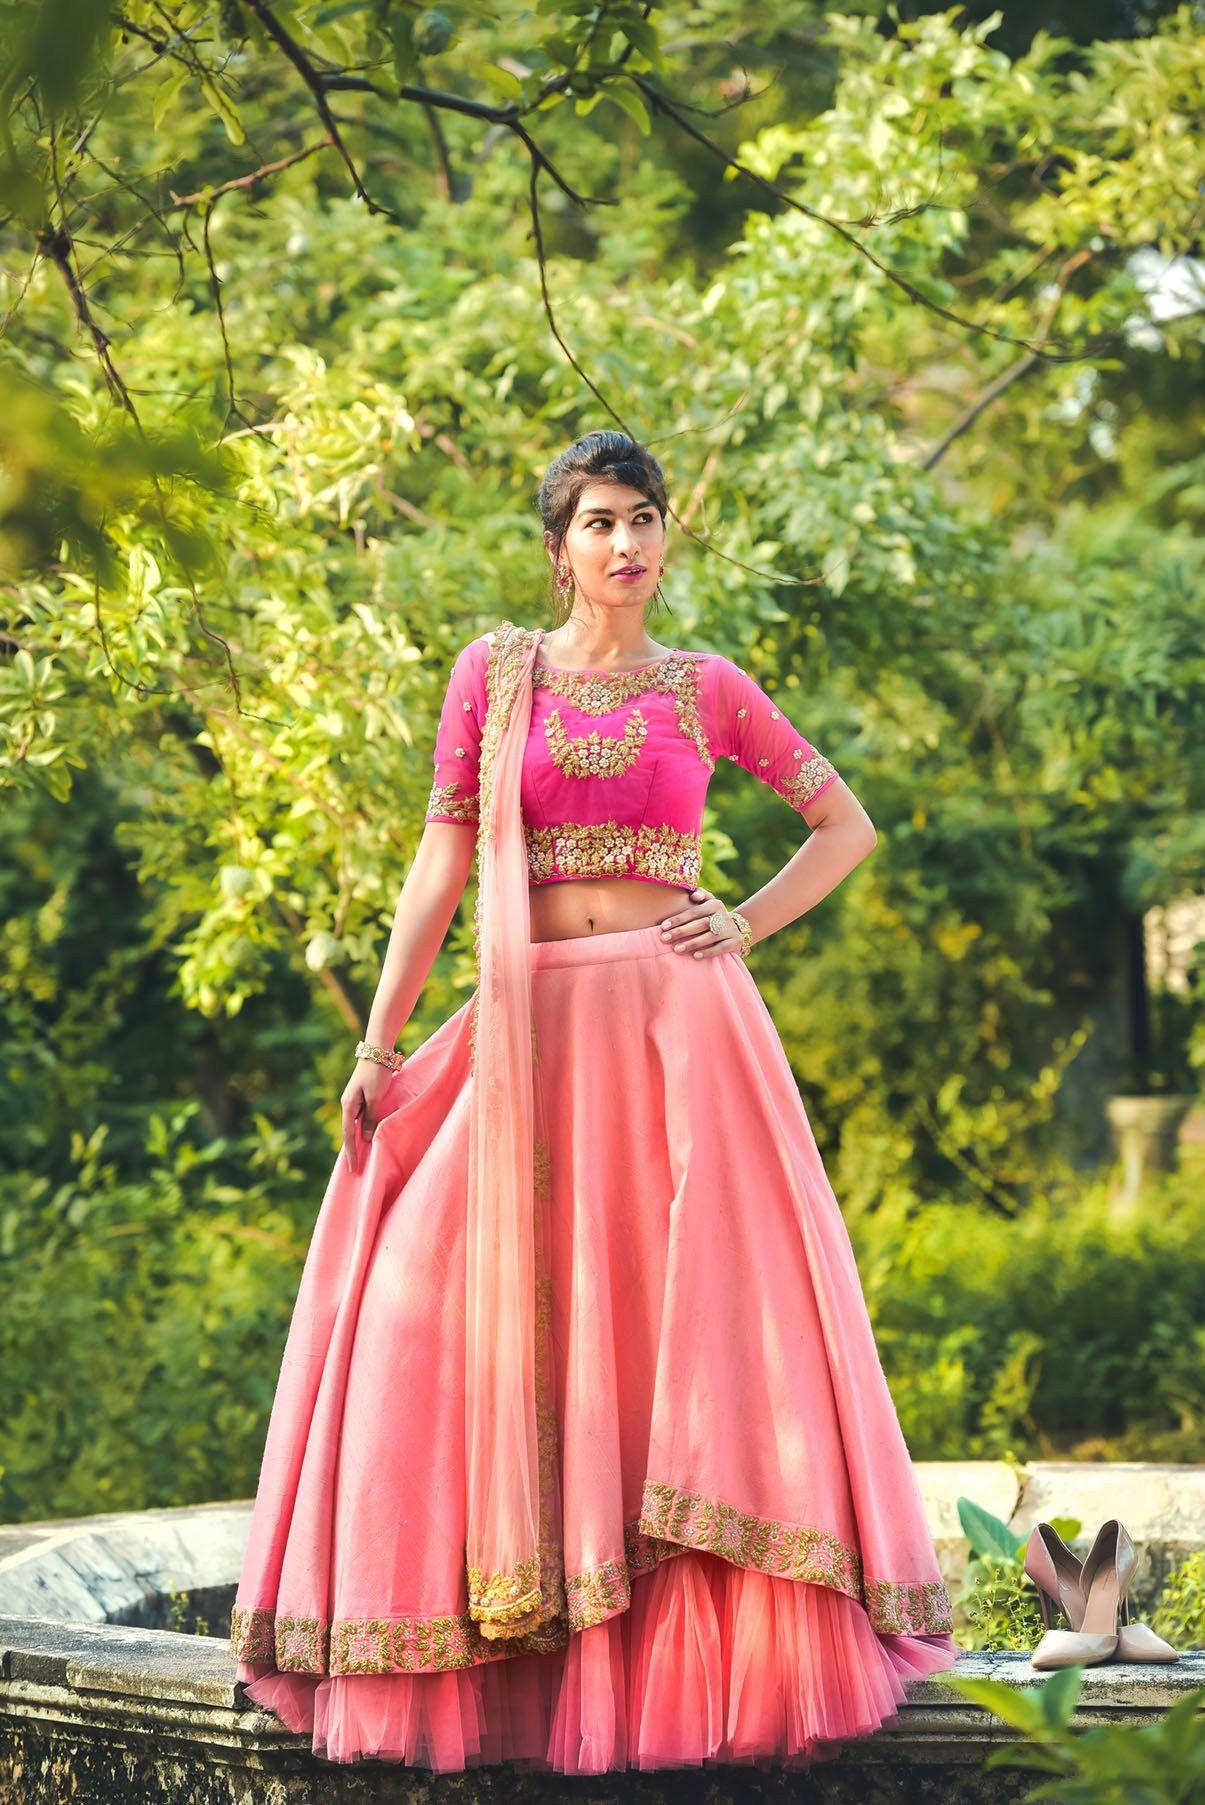 b549a37048 Beautiful bridal pink lehenga set by Puwin Couture Surat #Frugal2Fab